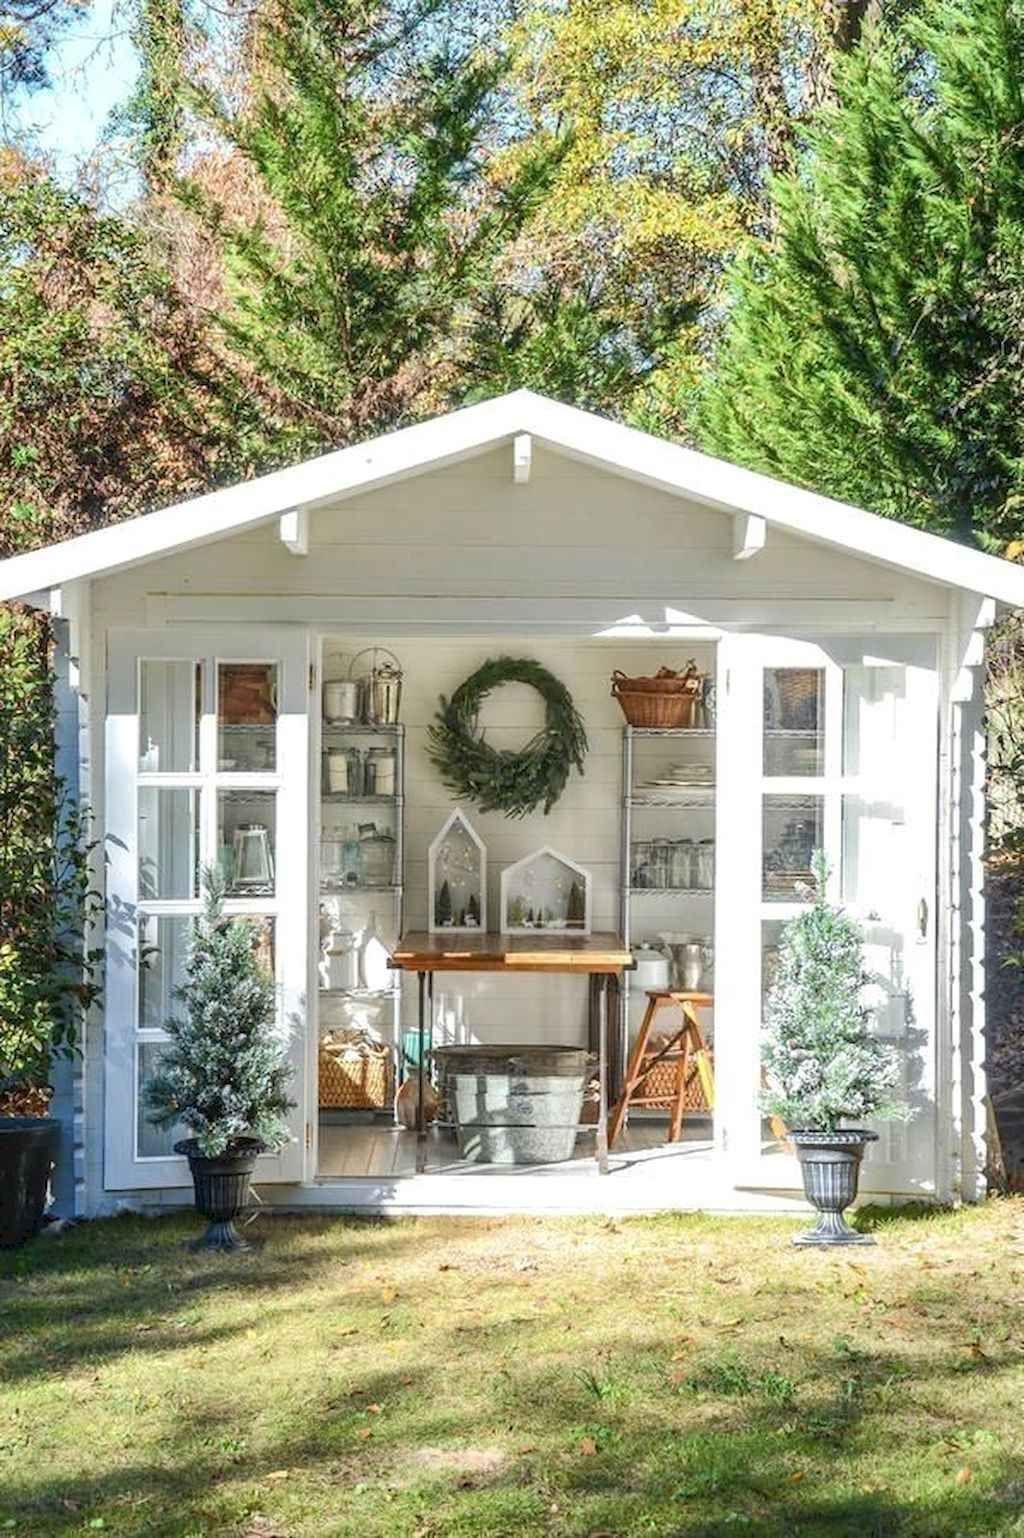 Awesome Backyard Storage Sheds Design Ideas 29